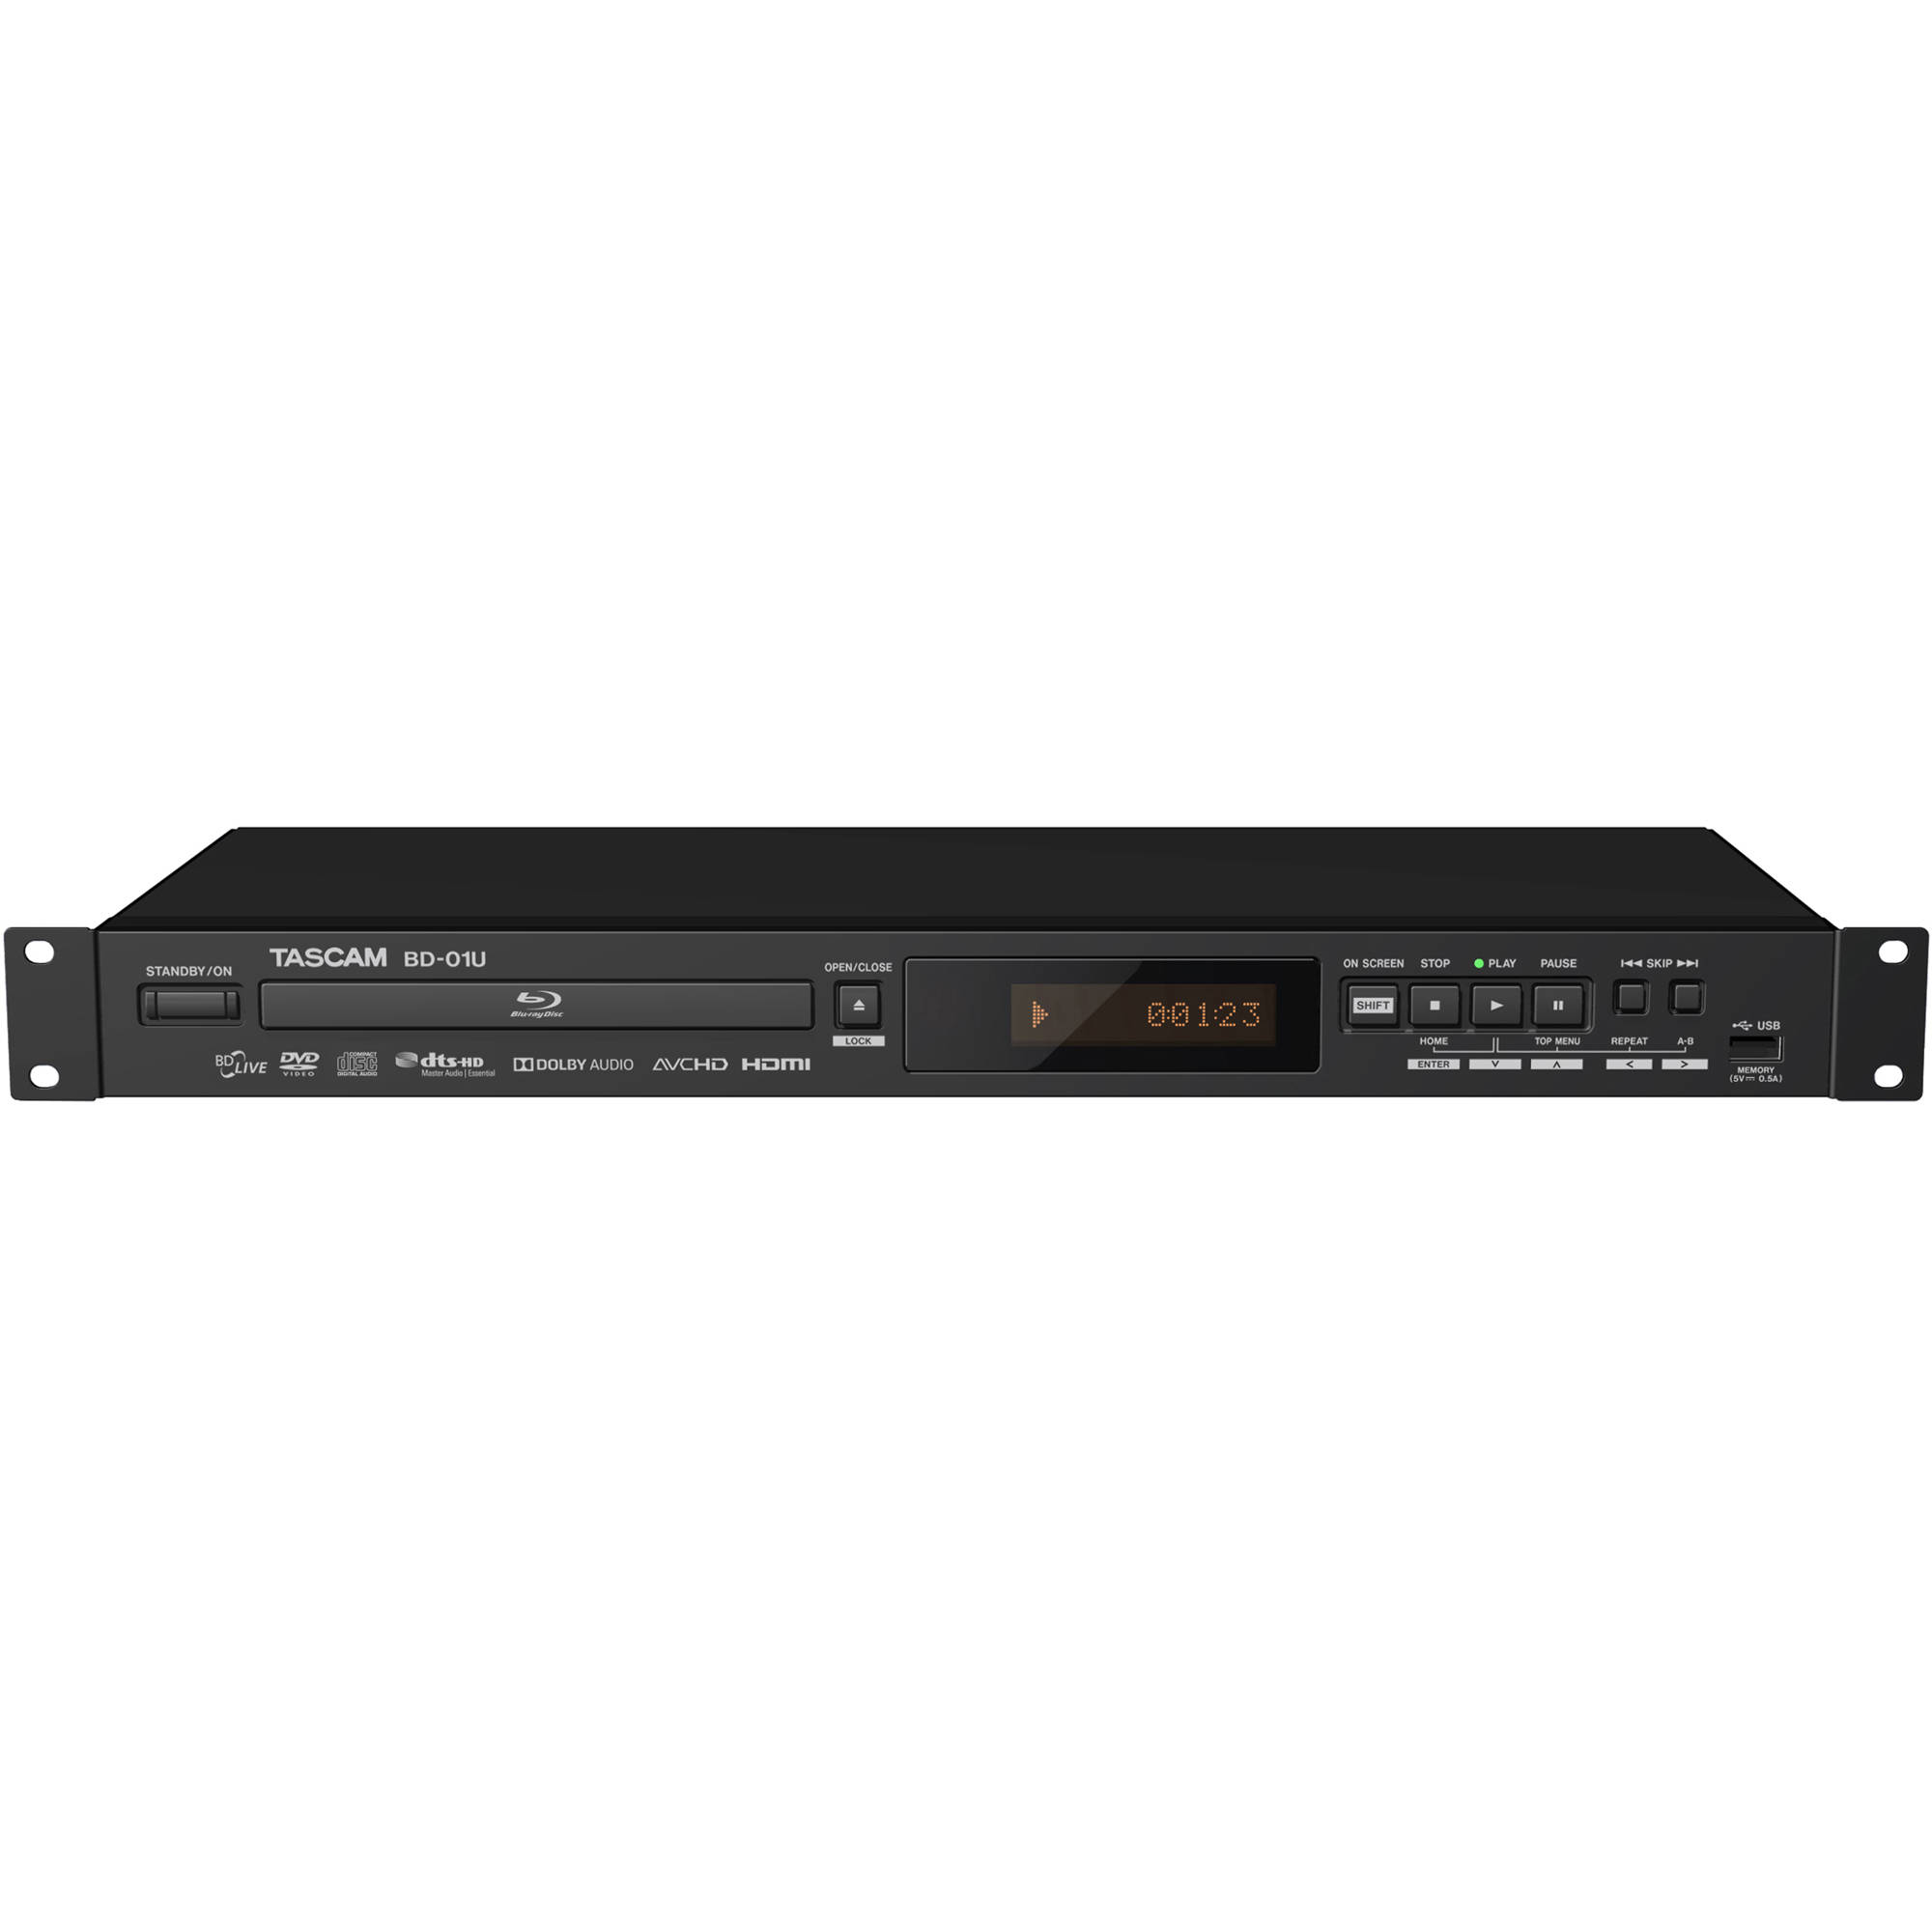 Tascam Bd 01u Rackmount Blu Ray Player